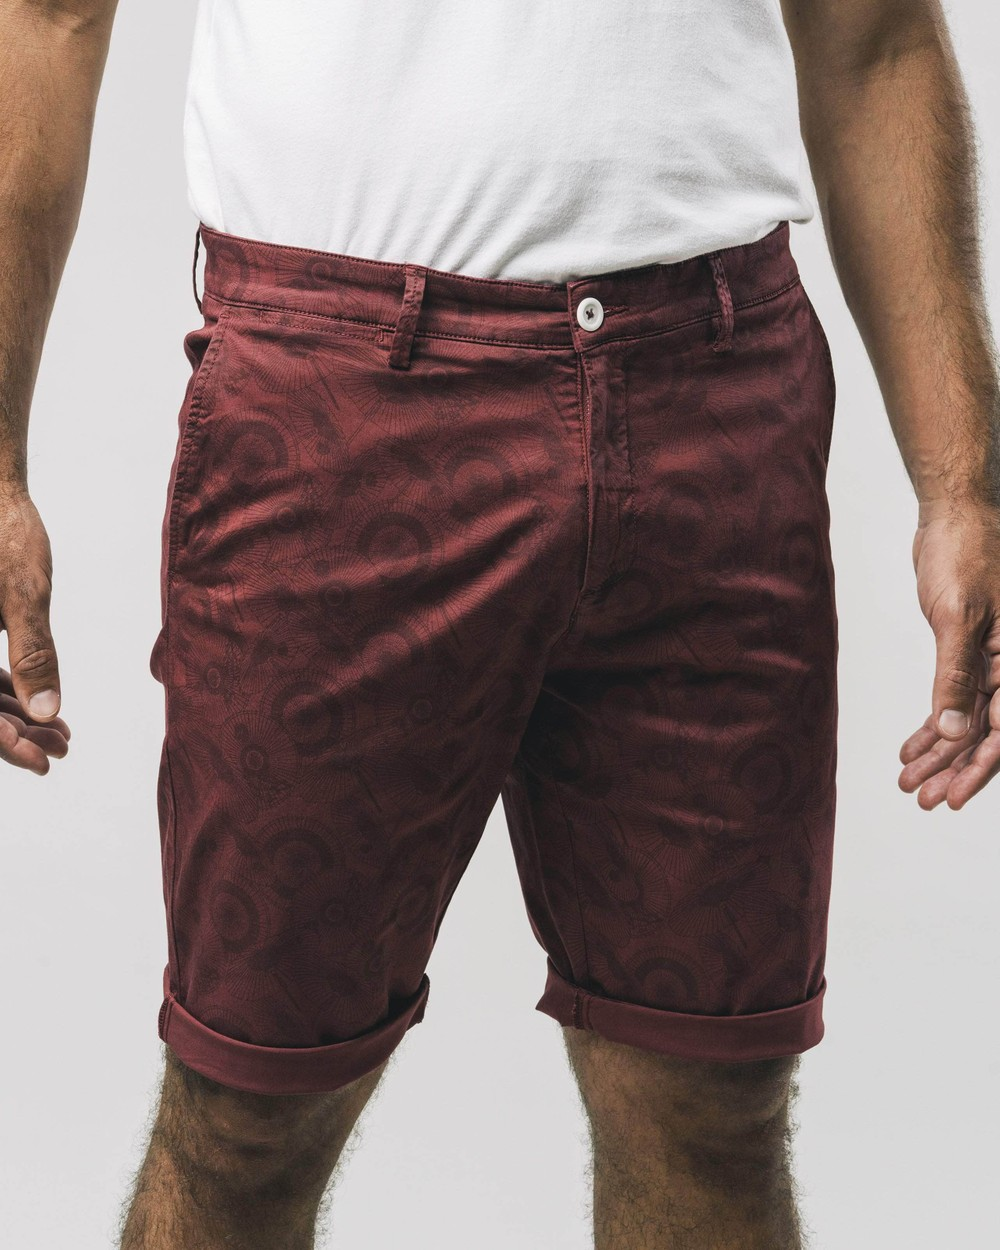 The osaka parasol printed shorts - Brava Fabrics